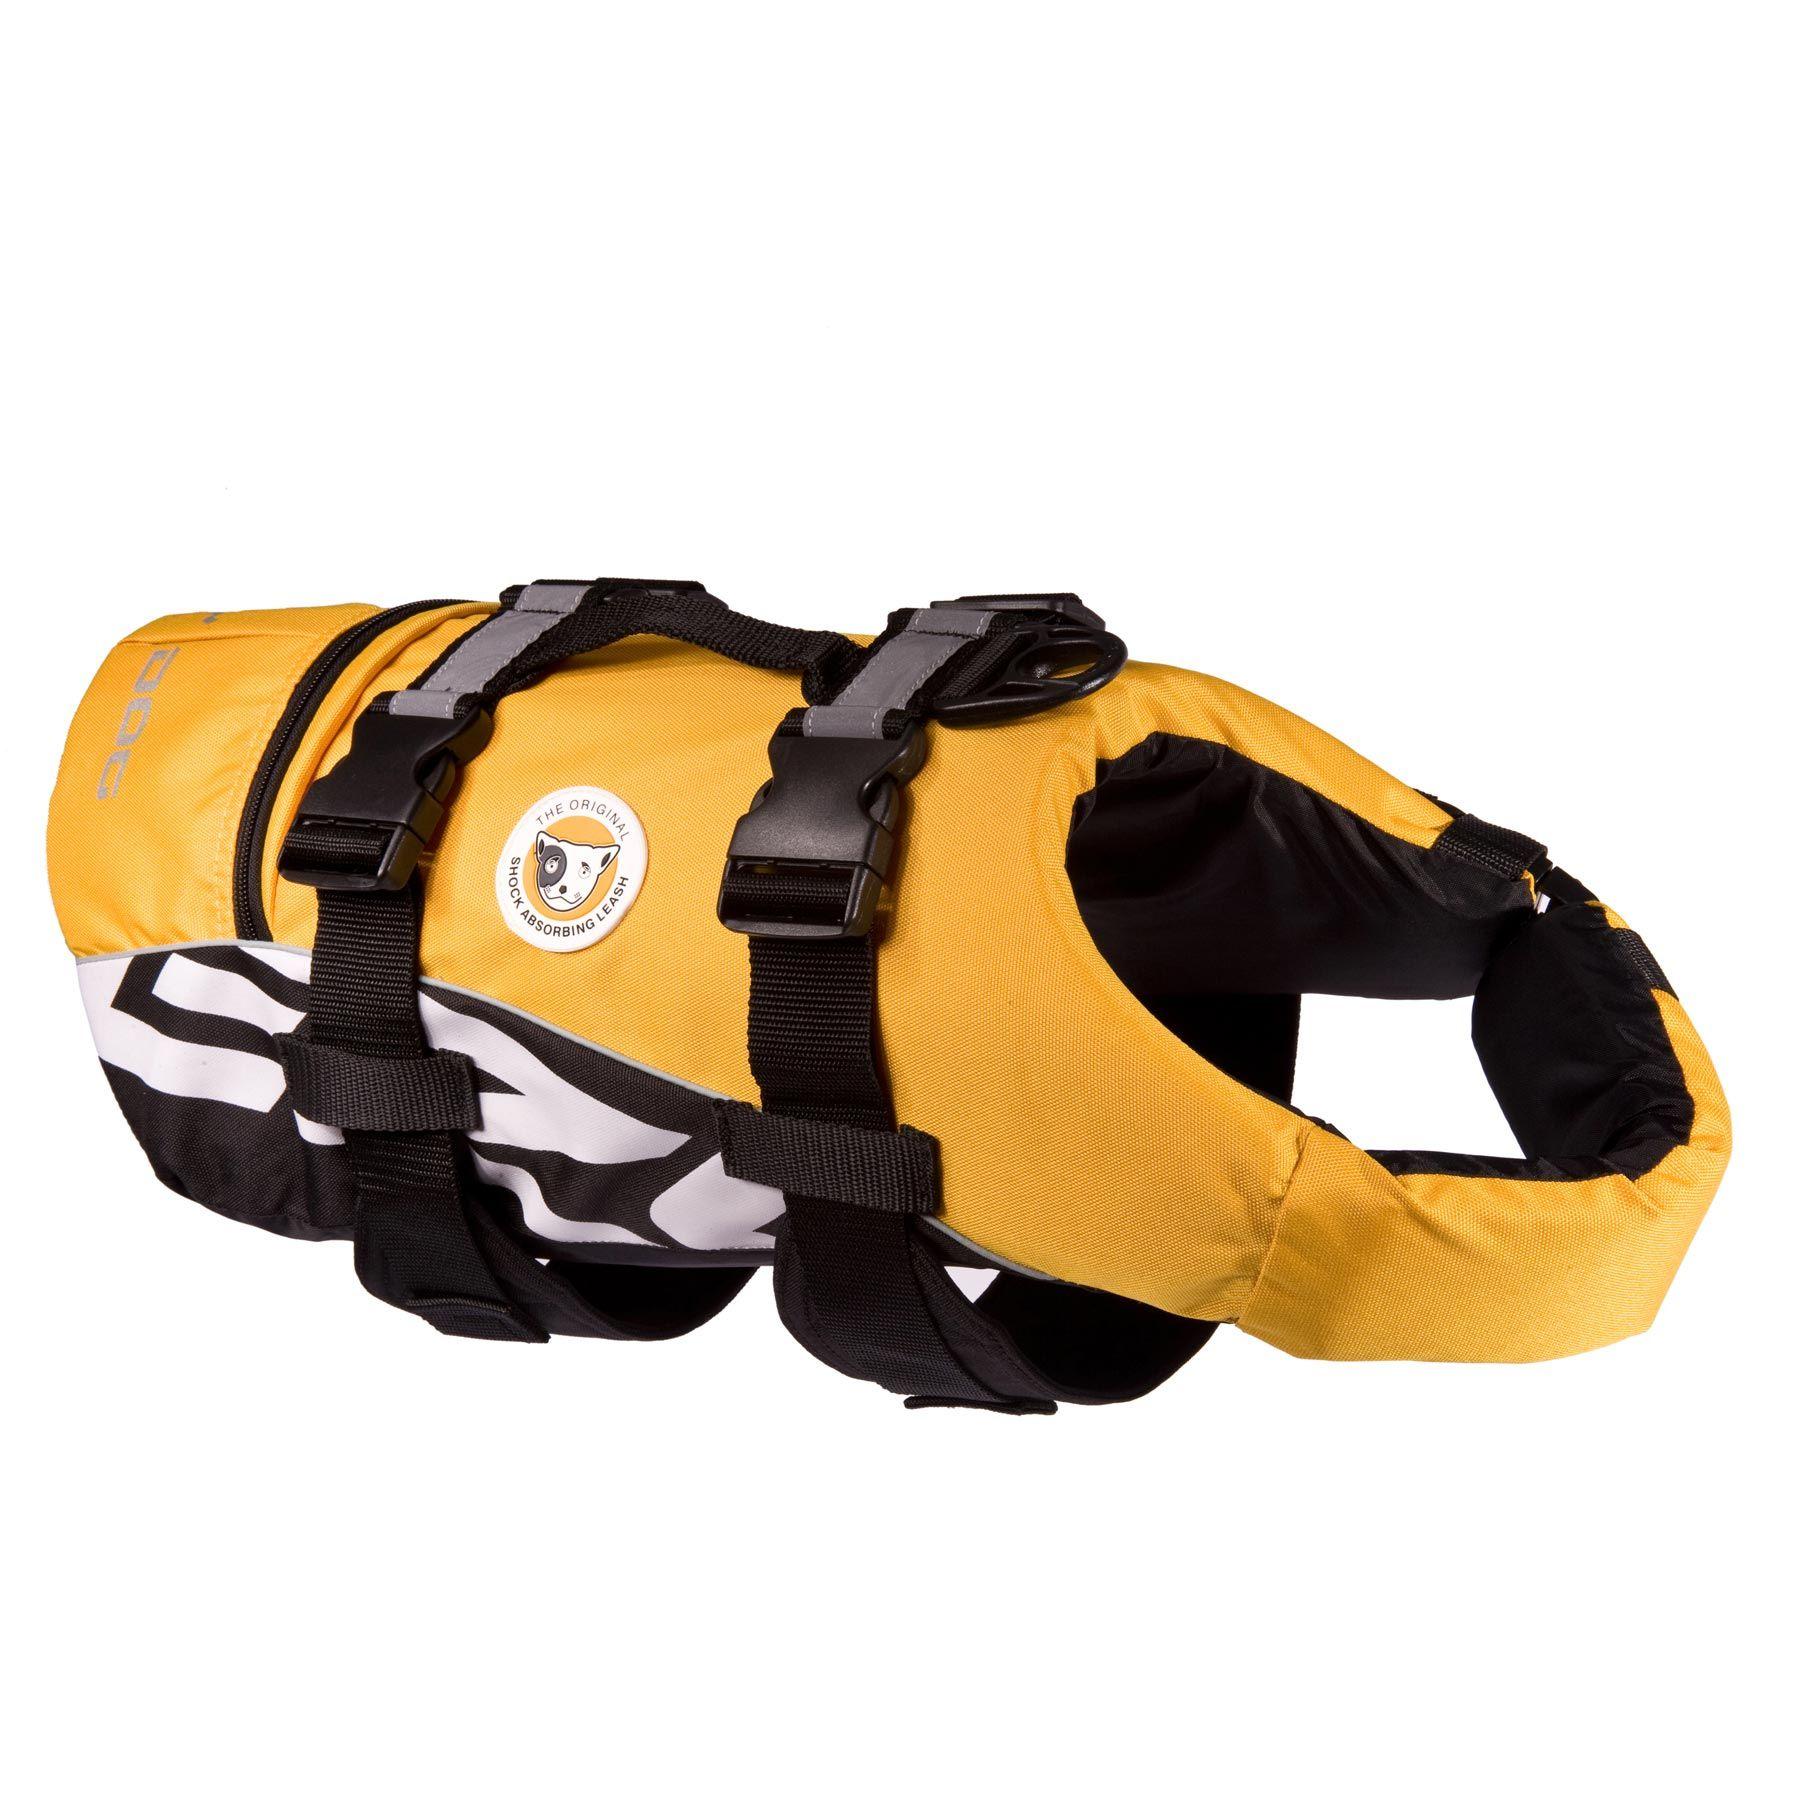 DFD Dog Flotation Device